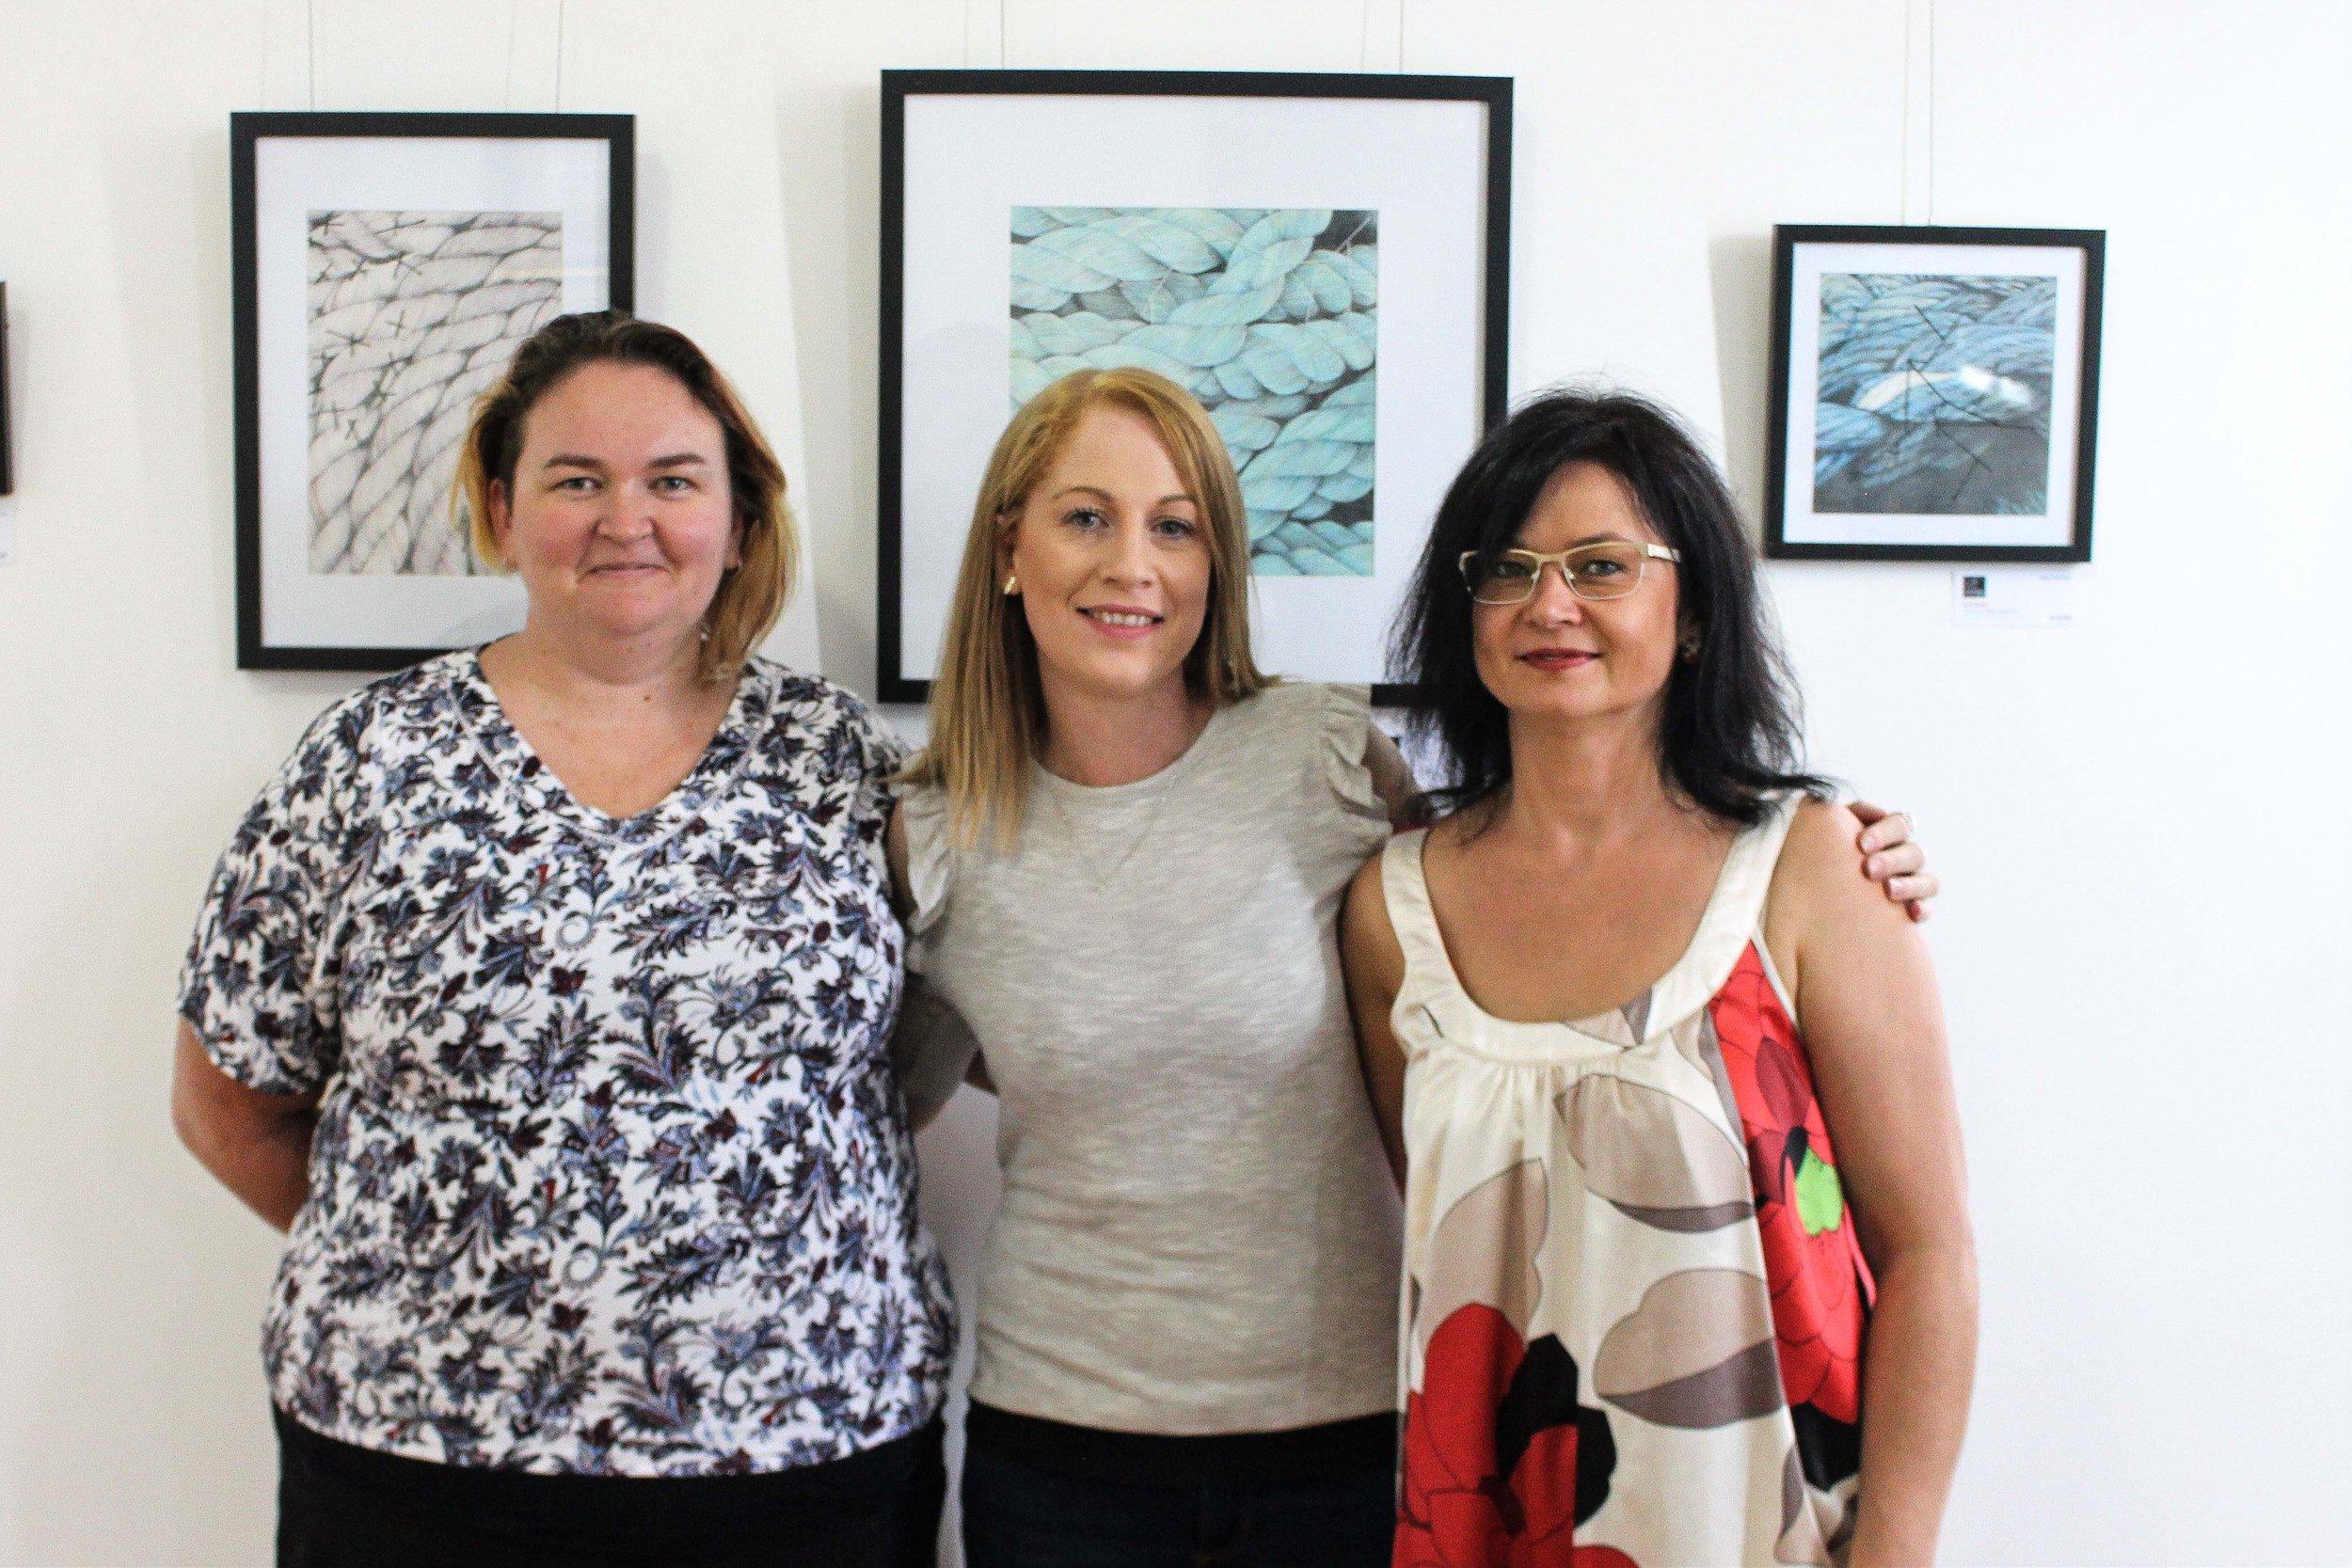 Corrina McLaughlin, Chantel Schott and Renata Buziak. Photography by Rochelle Blakelock.